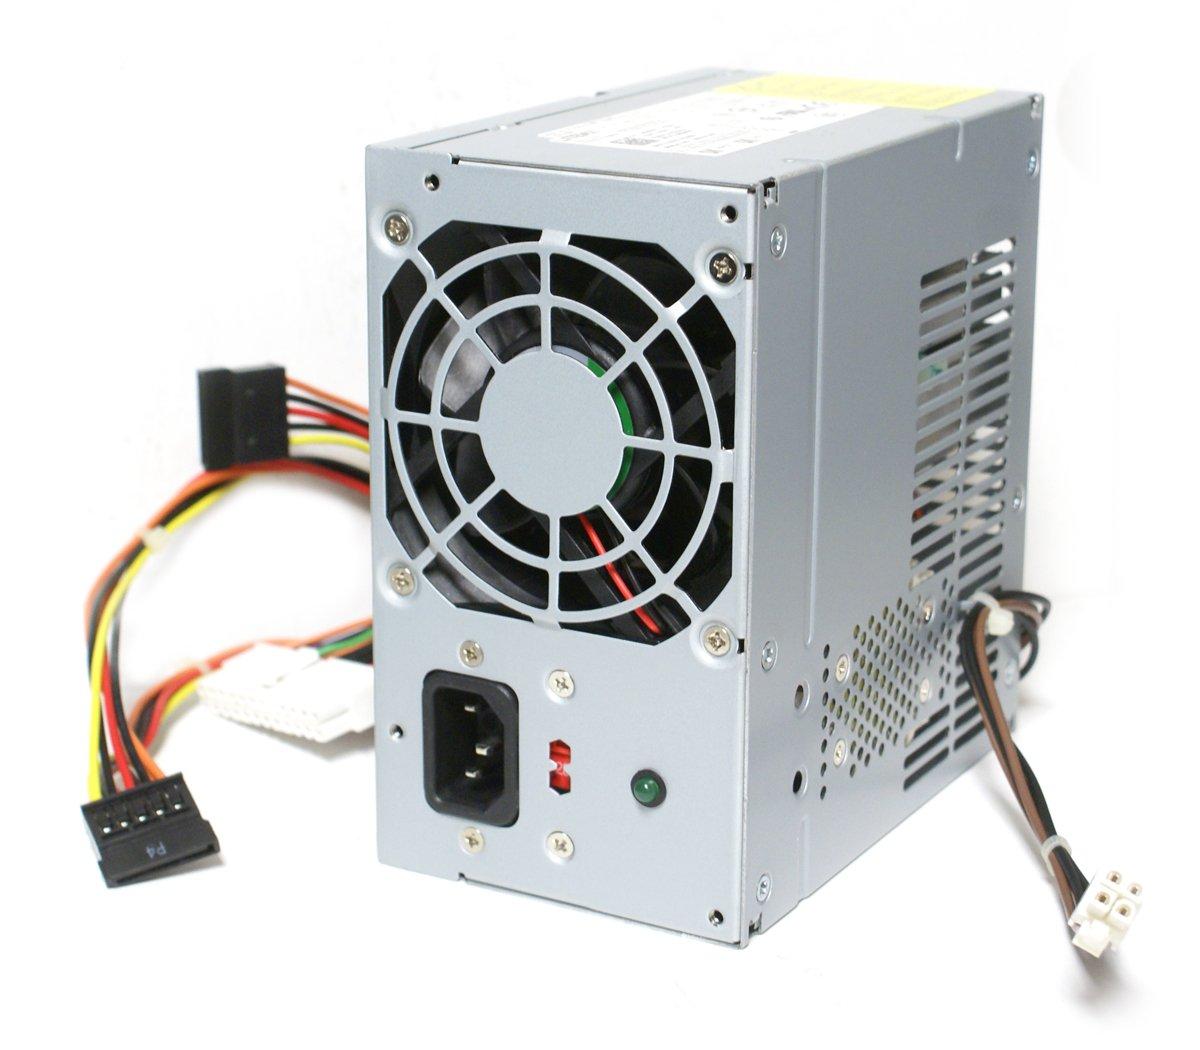 Genuine 300 Watt Xw600 Xw601 Replacement Power Supply Need Help With Dell Inspiron 570 New Case Switch Wiring Problem Brick Psu For Vostro 200 201 400 220 530 531541 518 519 537